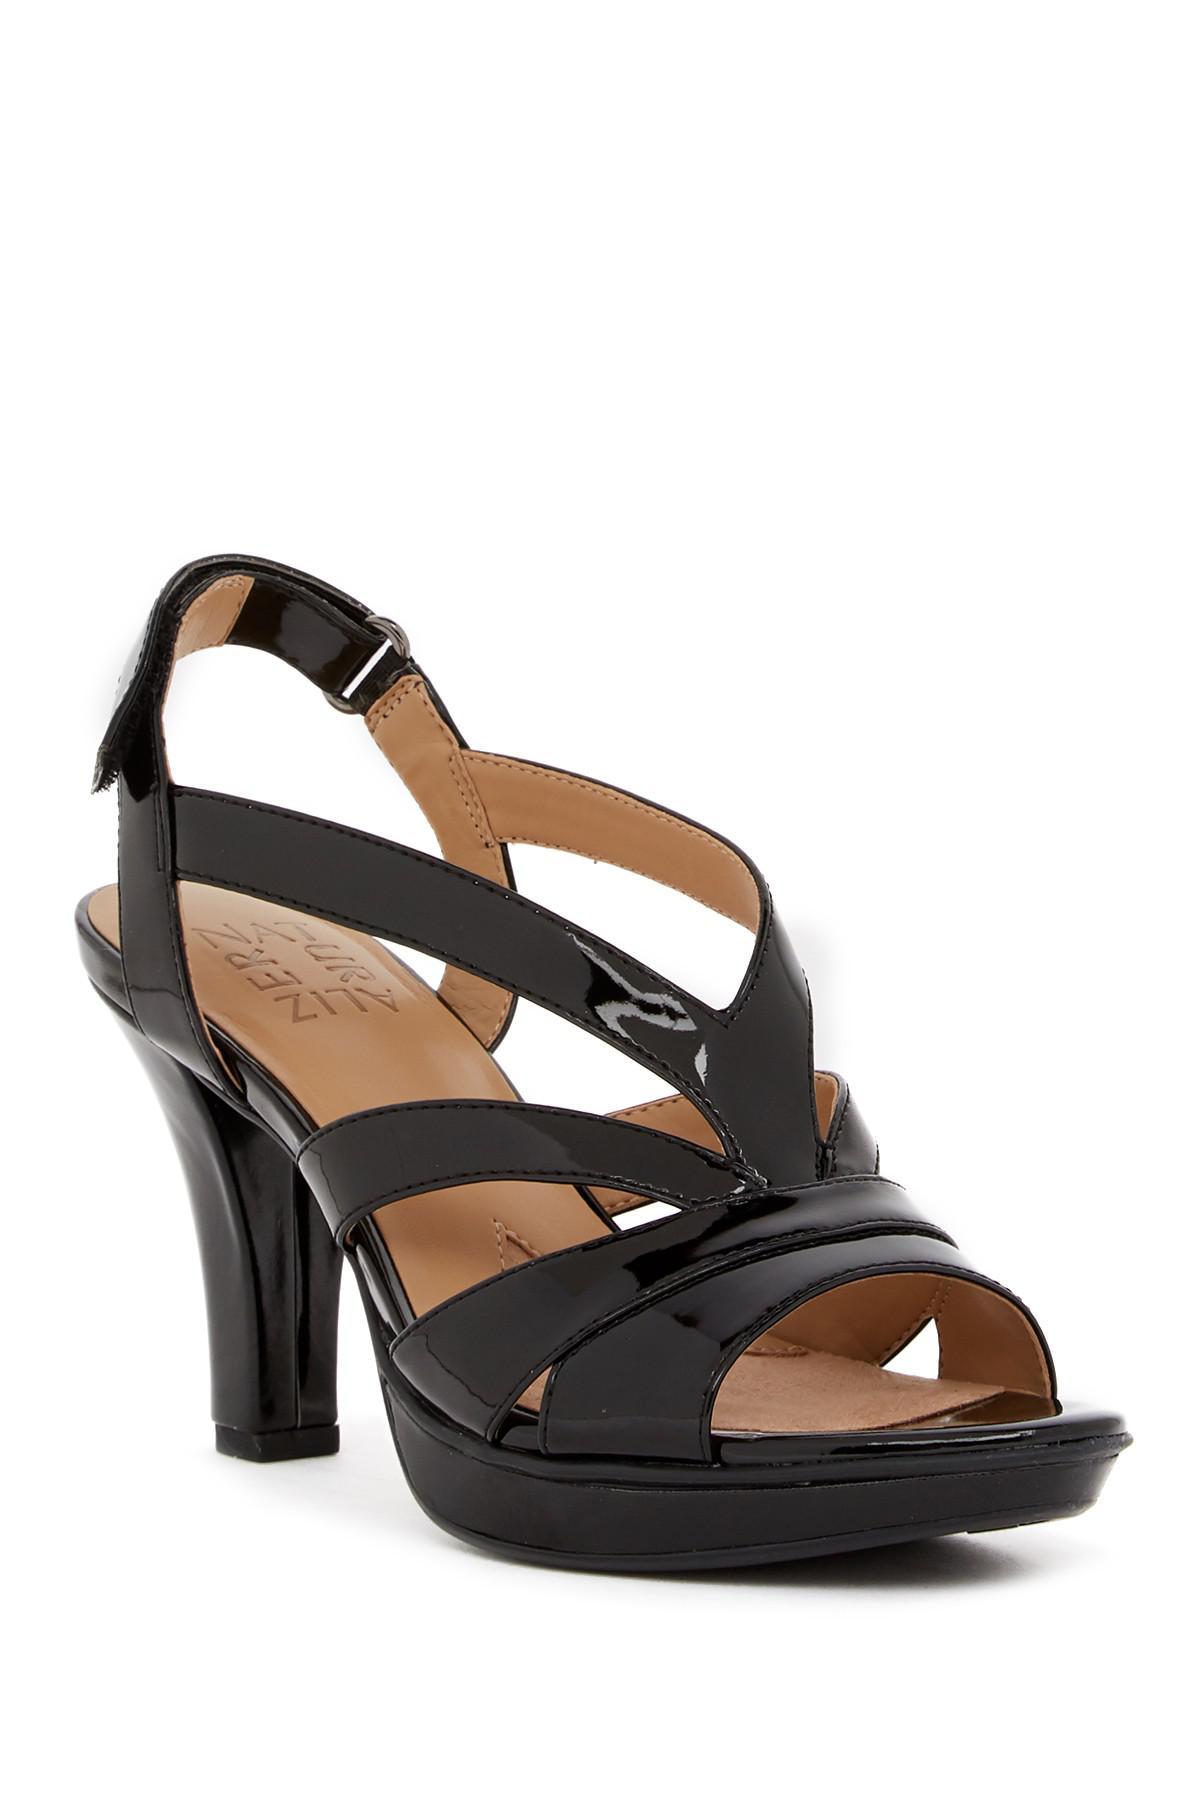 c3c88c0504d4 Lyst - Naturalizer Delfinia Leather Heel Sandal - Wide Width ...